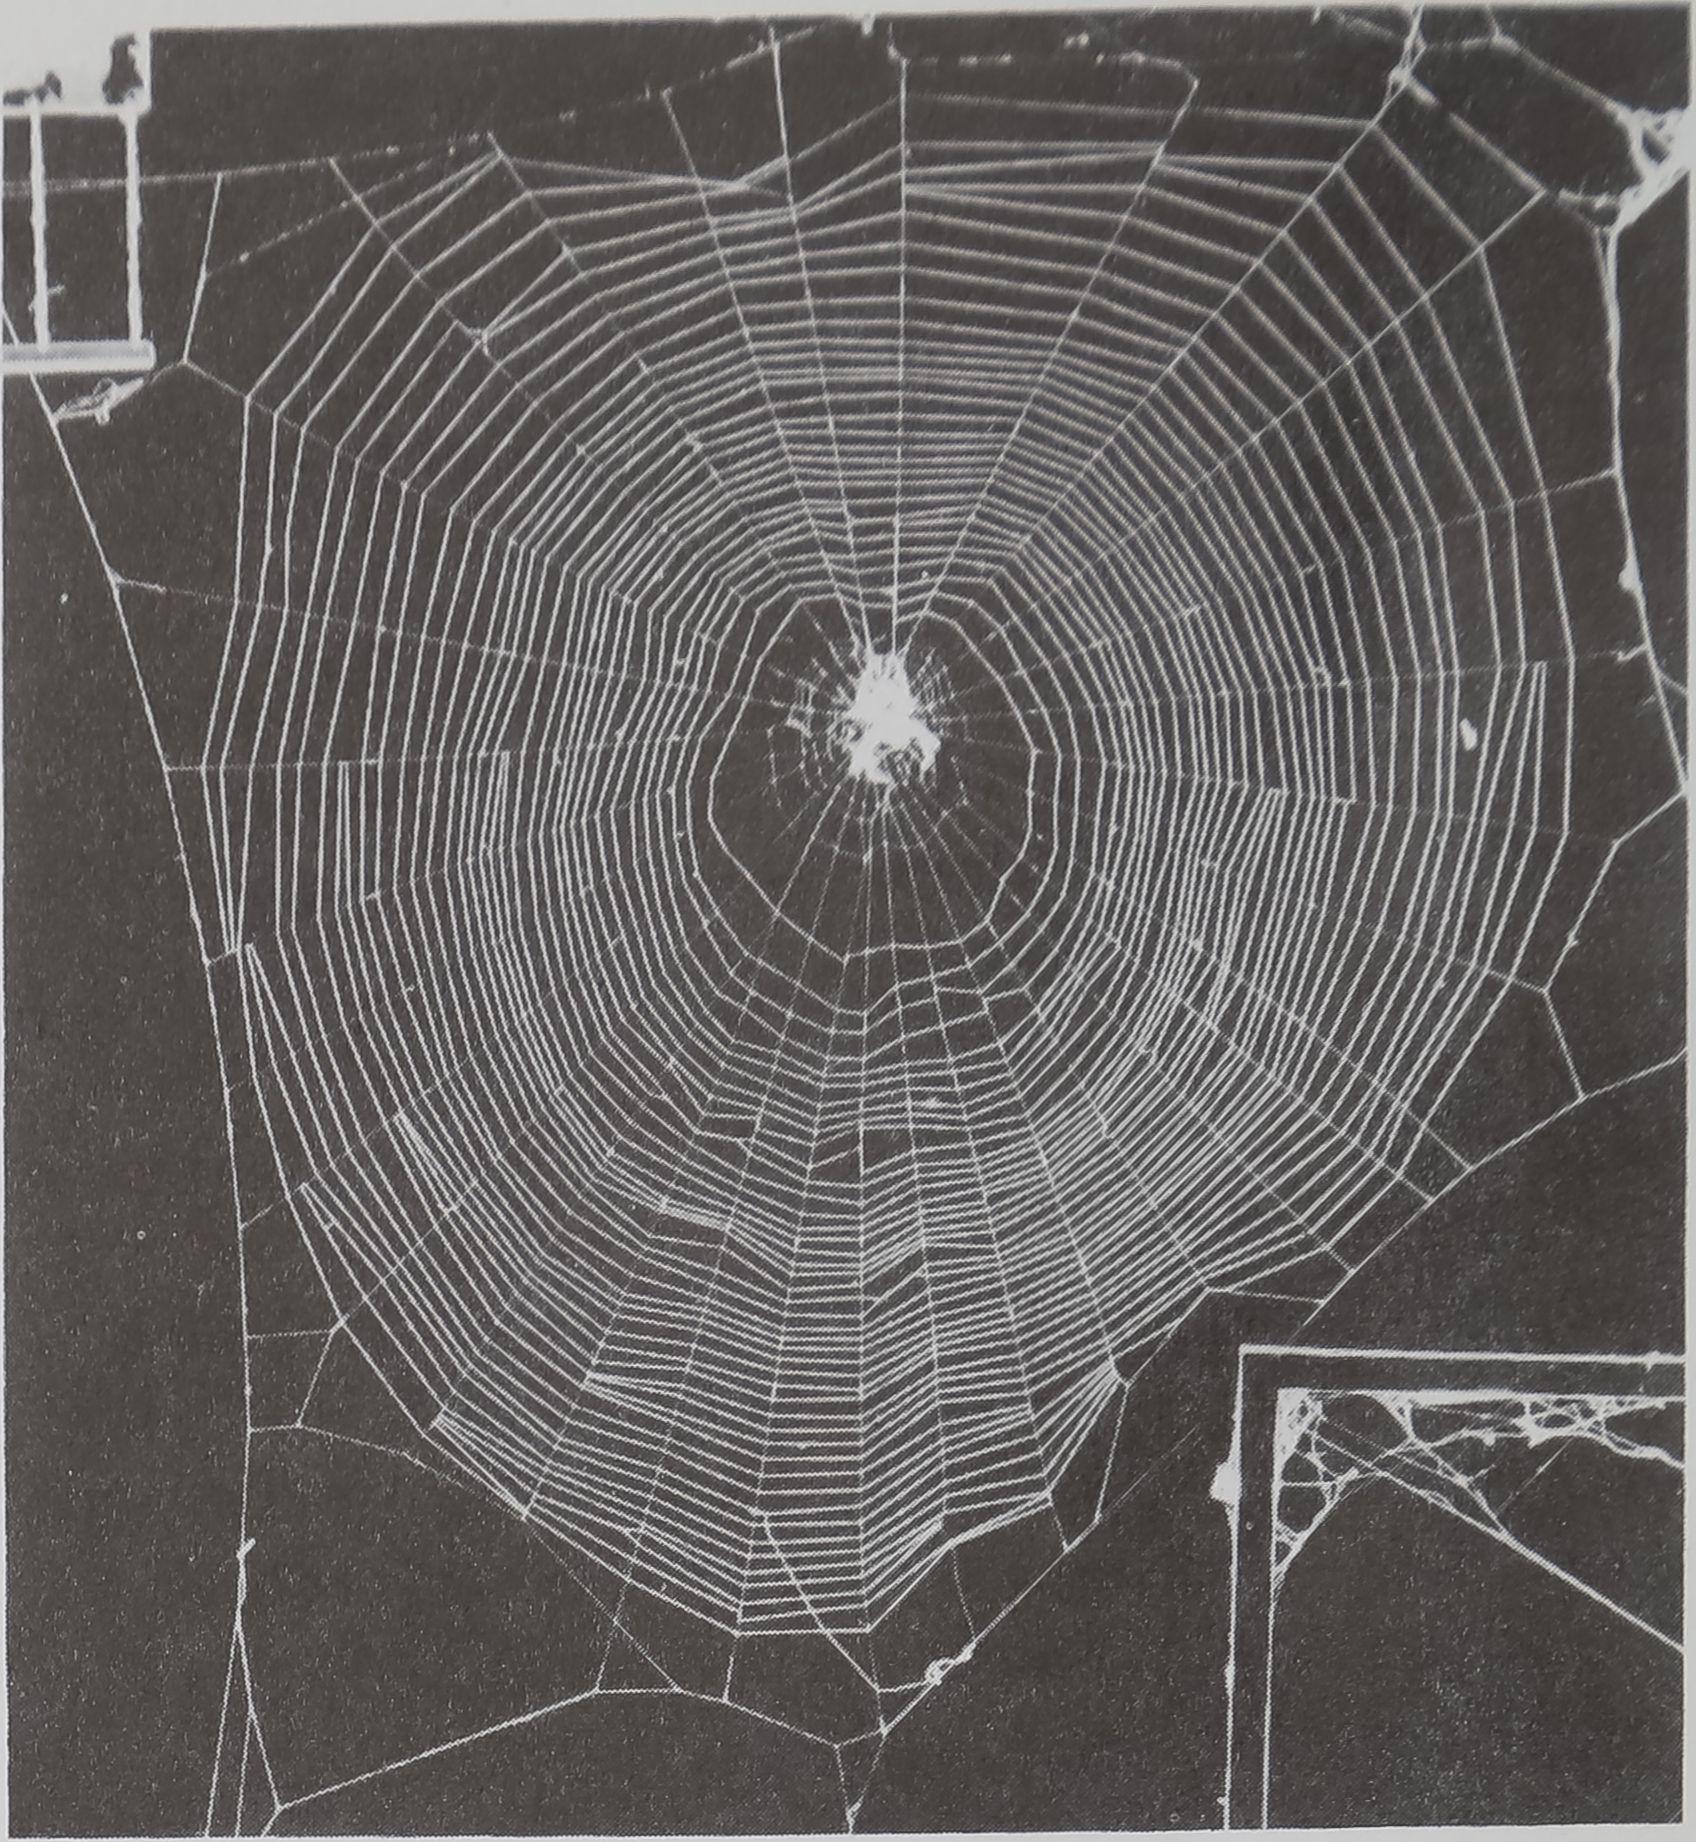 1976-SpiderWebsDesign-6